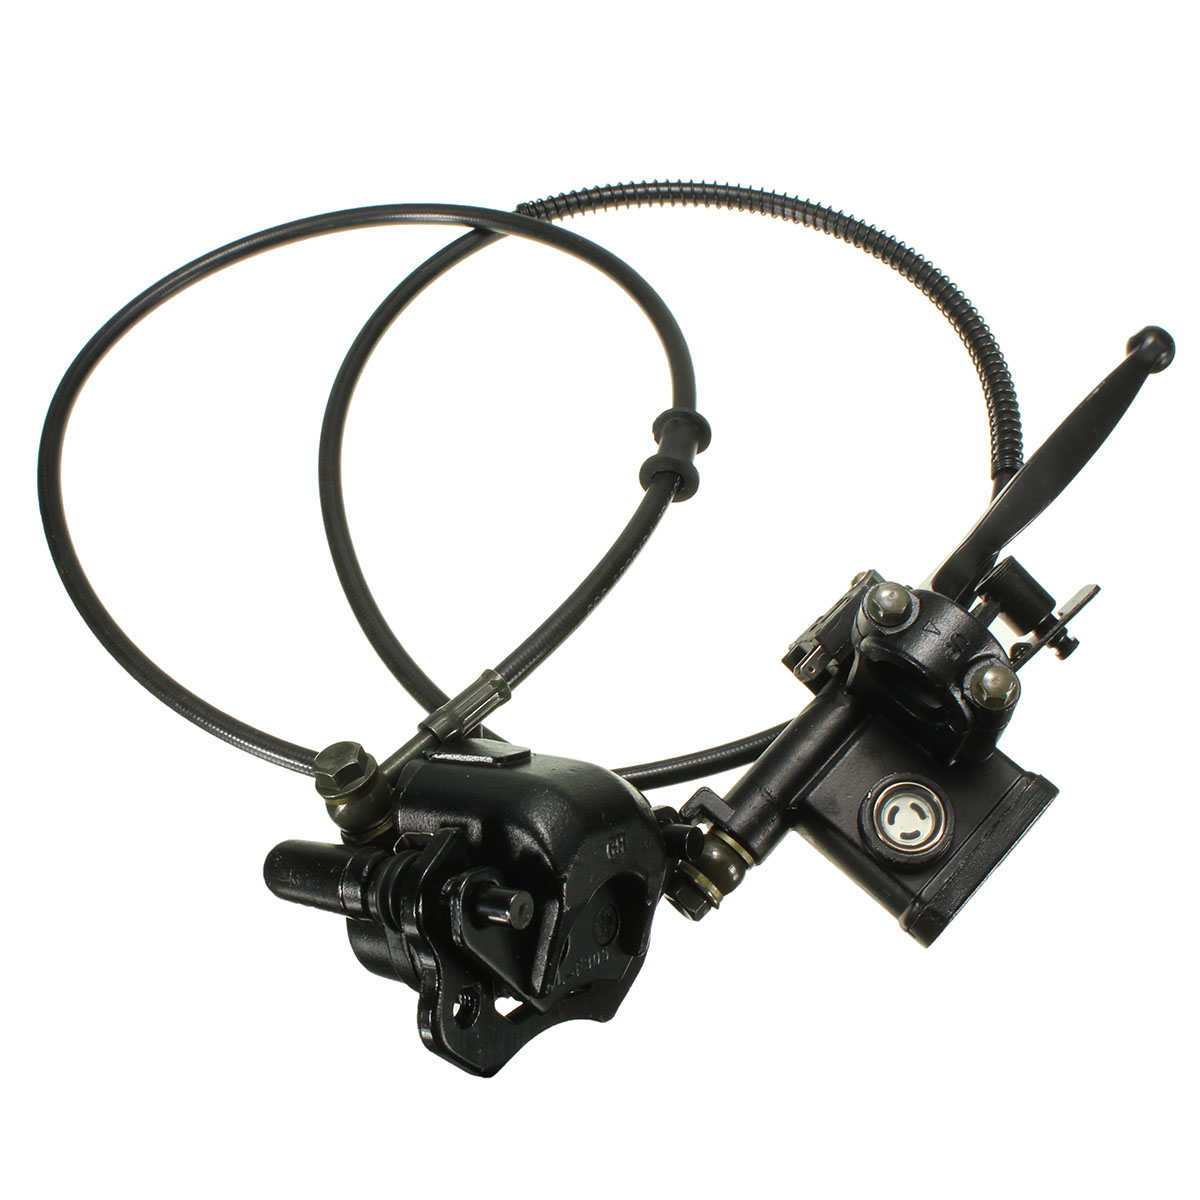 Hydraulic Rear Brake System Assembly KAYO BSE Dirt Bike Pit Bike Master Cylinder Caliper hose For ATV Quad 50CC 70CC 90CC 110CC